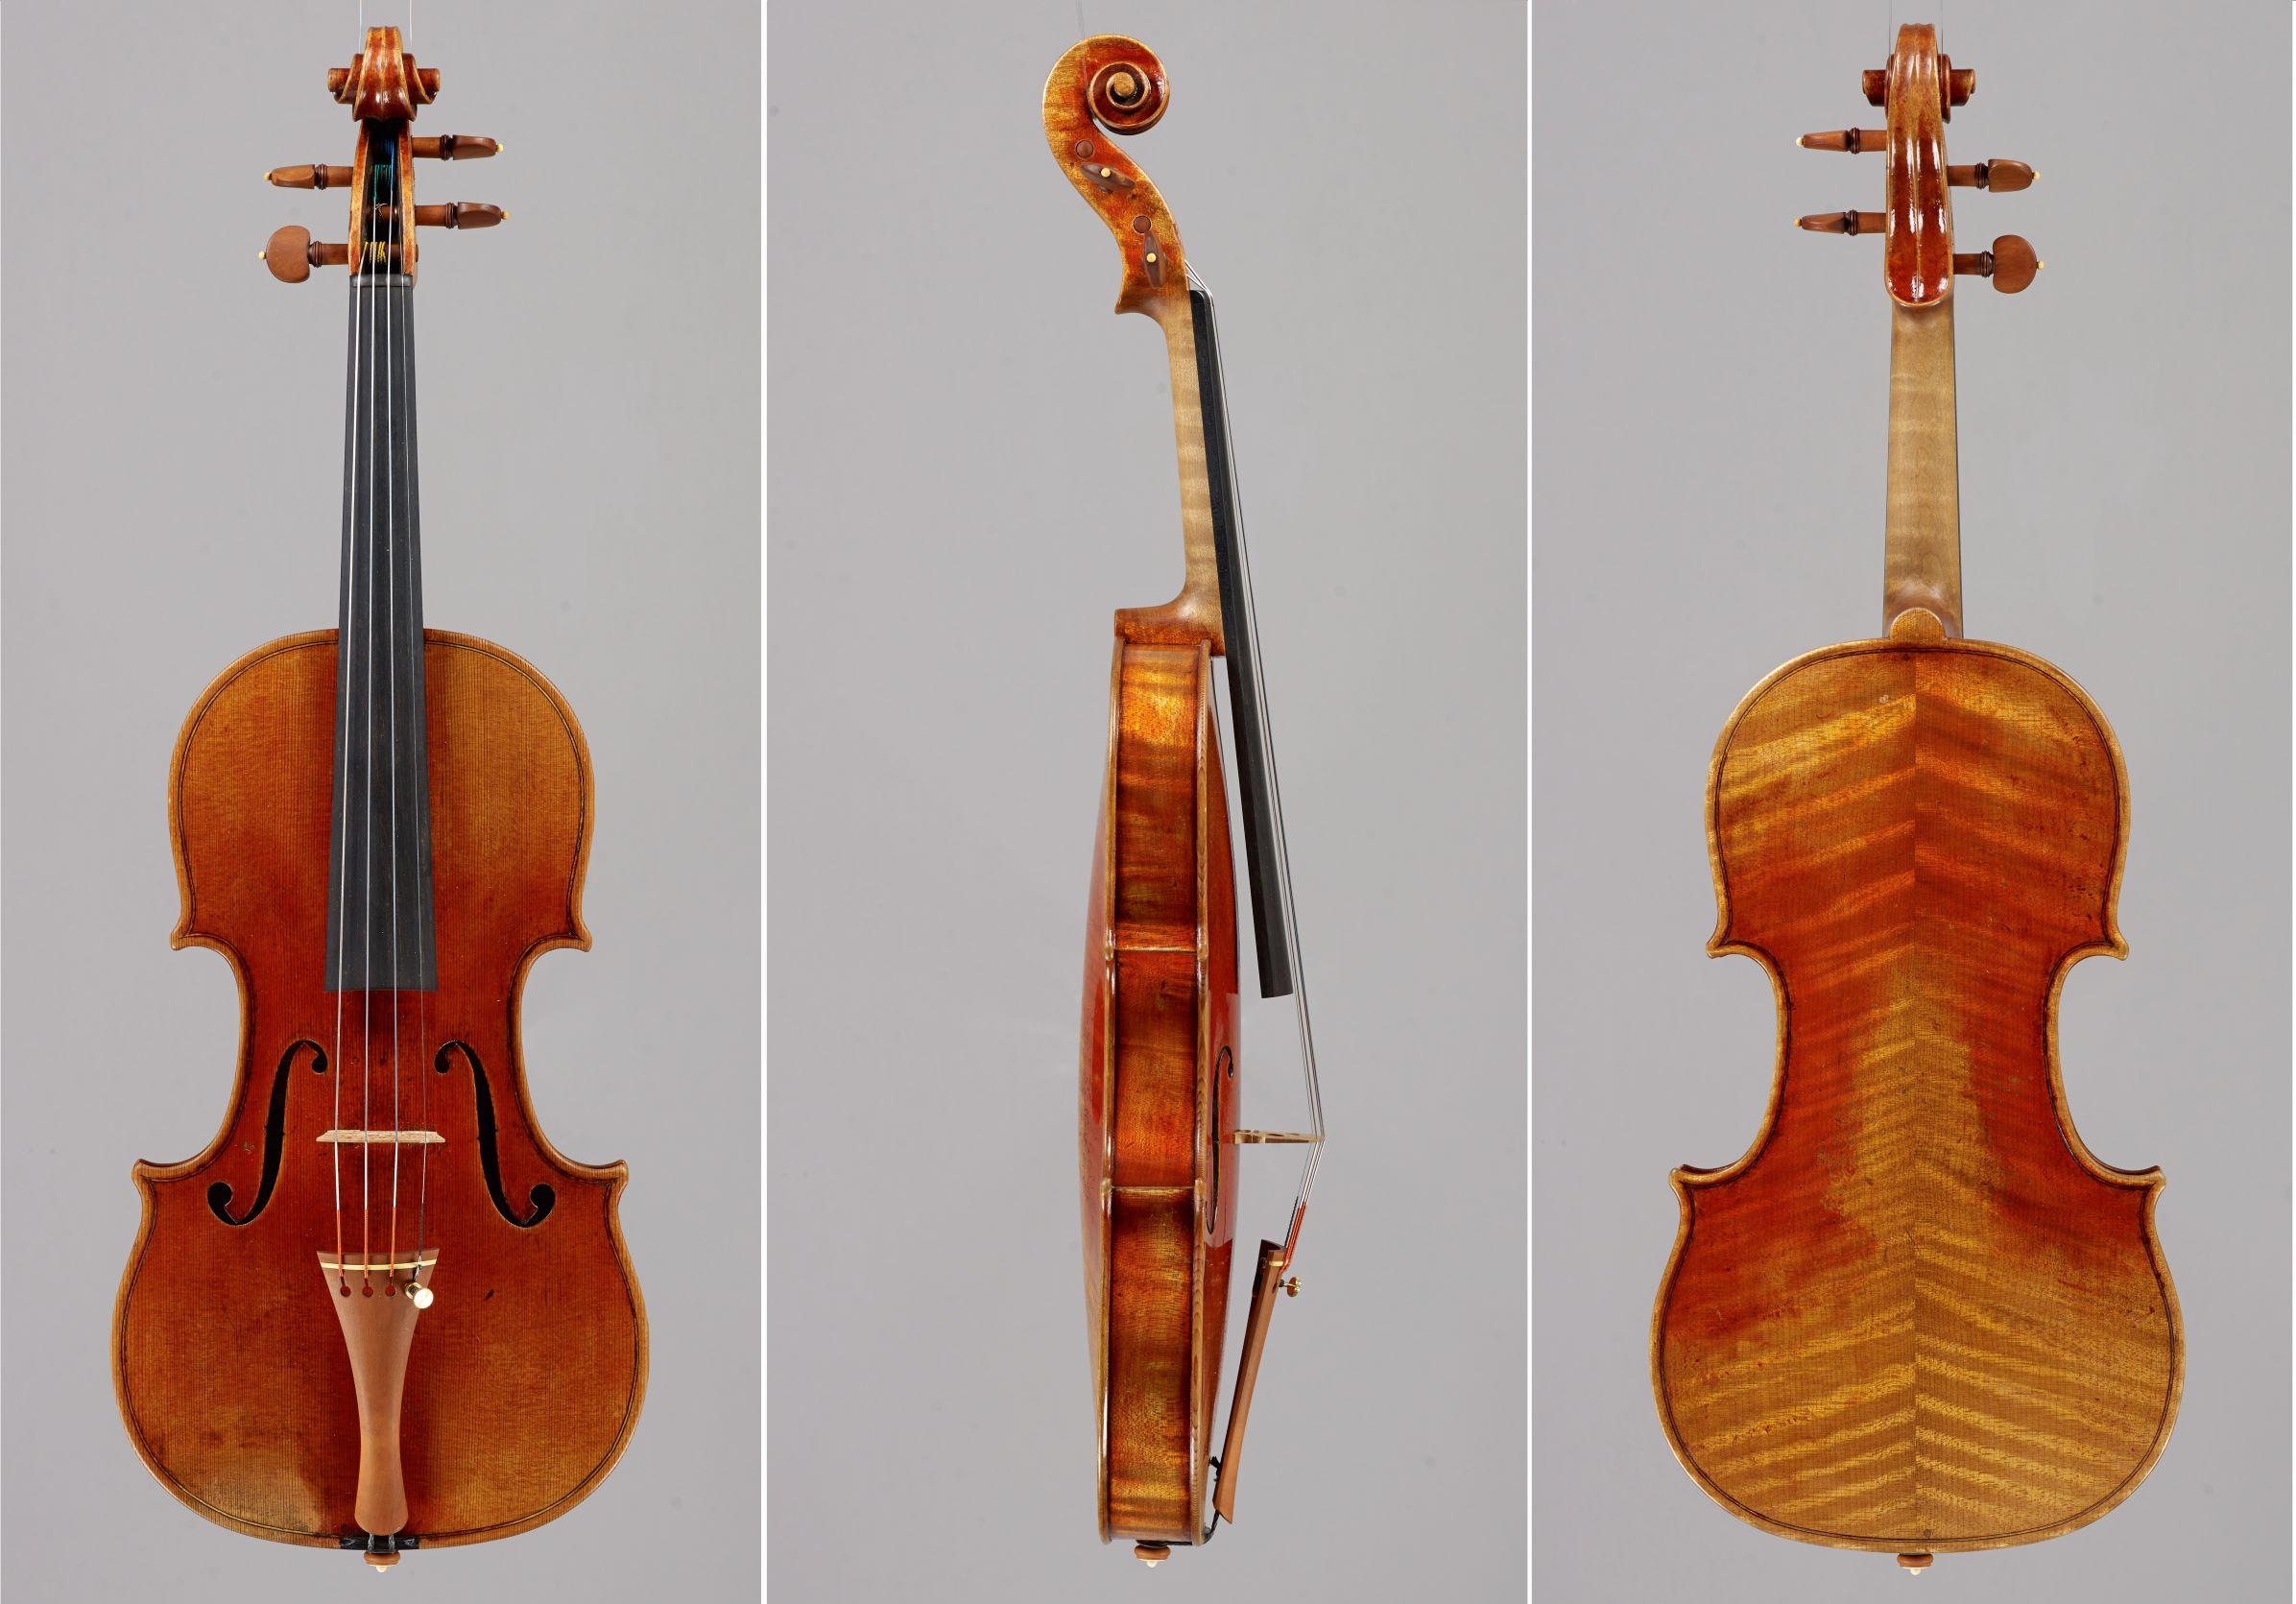 The Hill - Bergonzi Violin